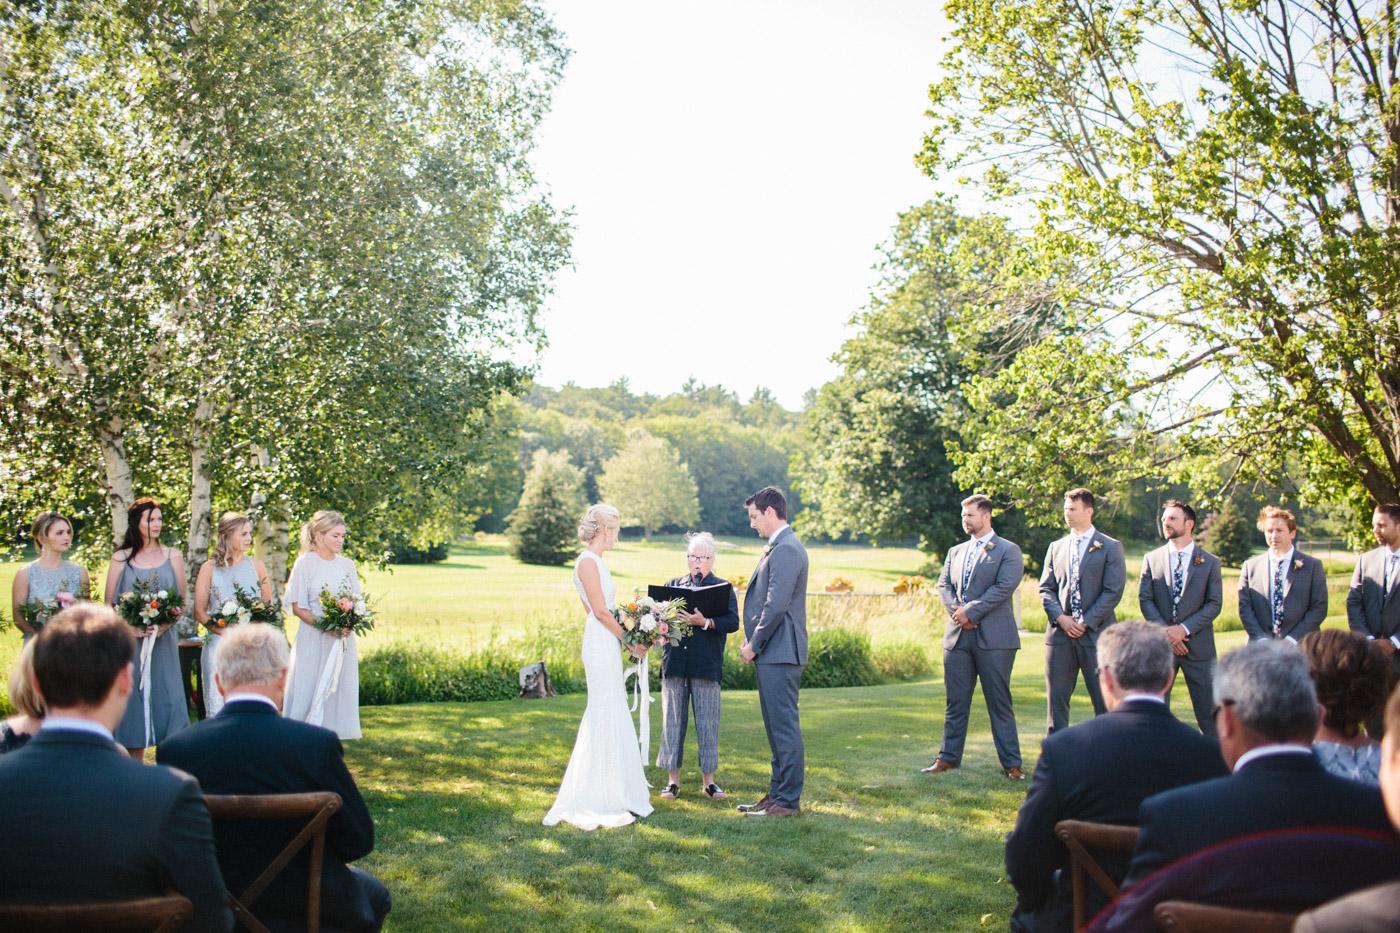 wedding_photography_tips_best_photography_lighting-4.jpg